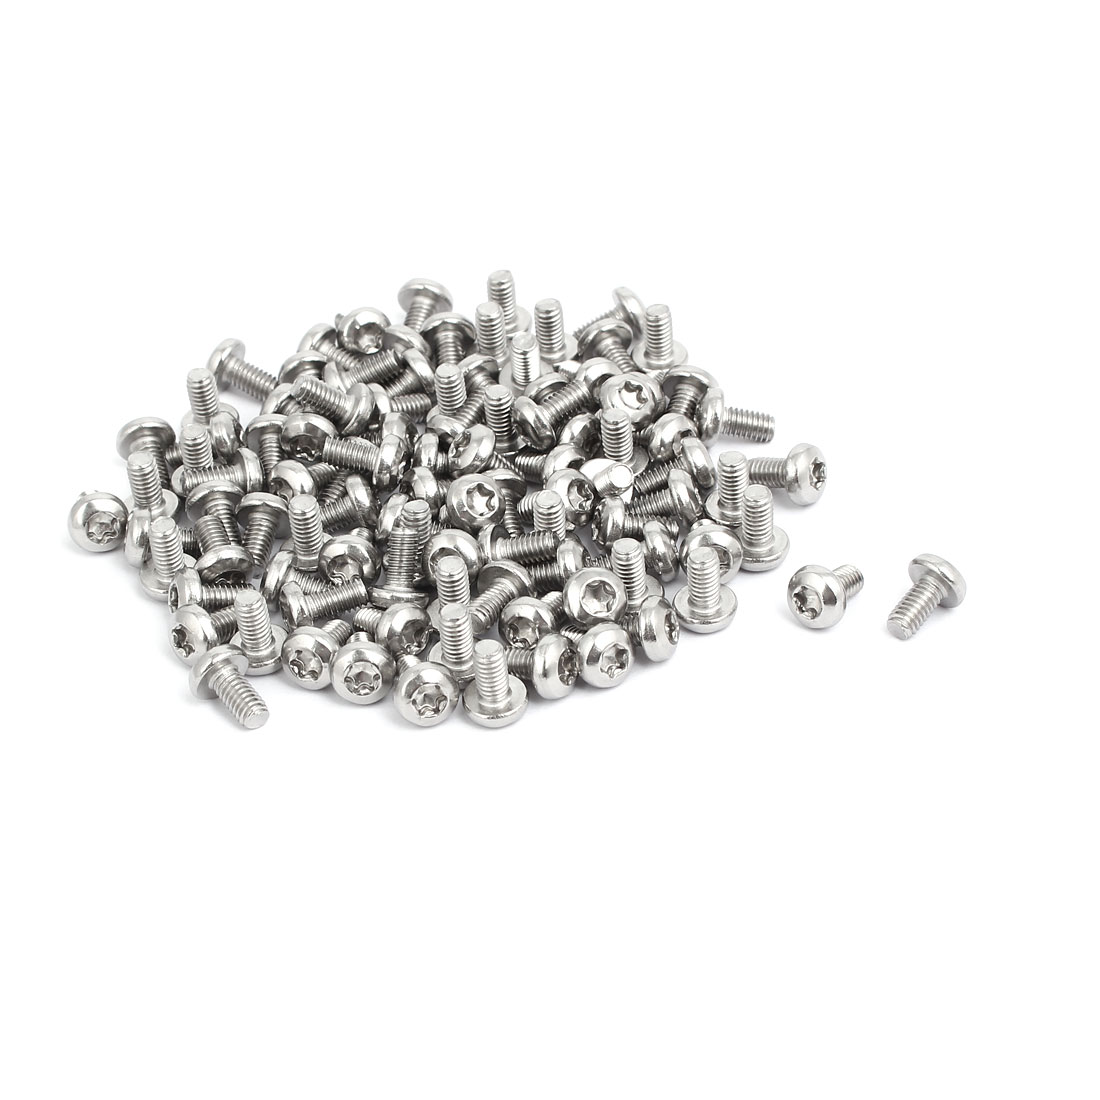 Unique Bargains M4x8mm 304 Stainless Steel Button Head Torx Screws Bolts T20 Drive 100pcs - image 2 of 3